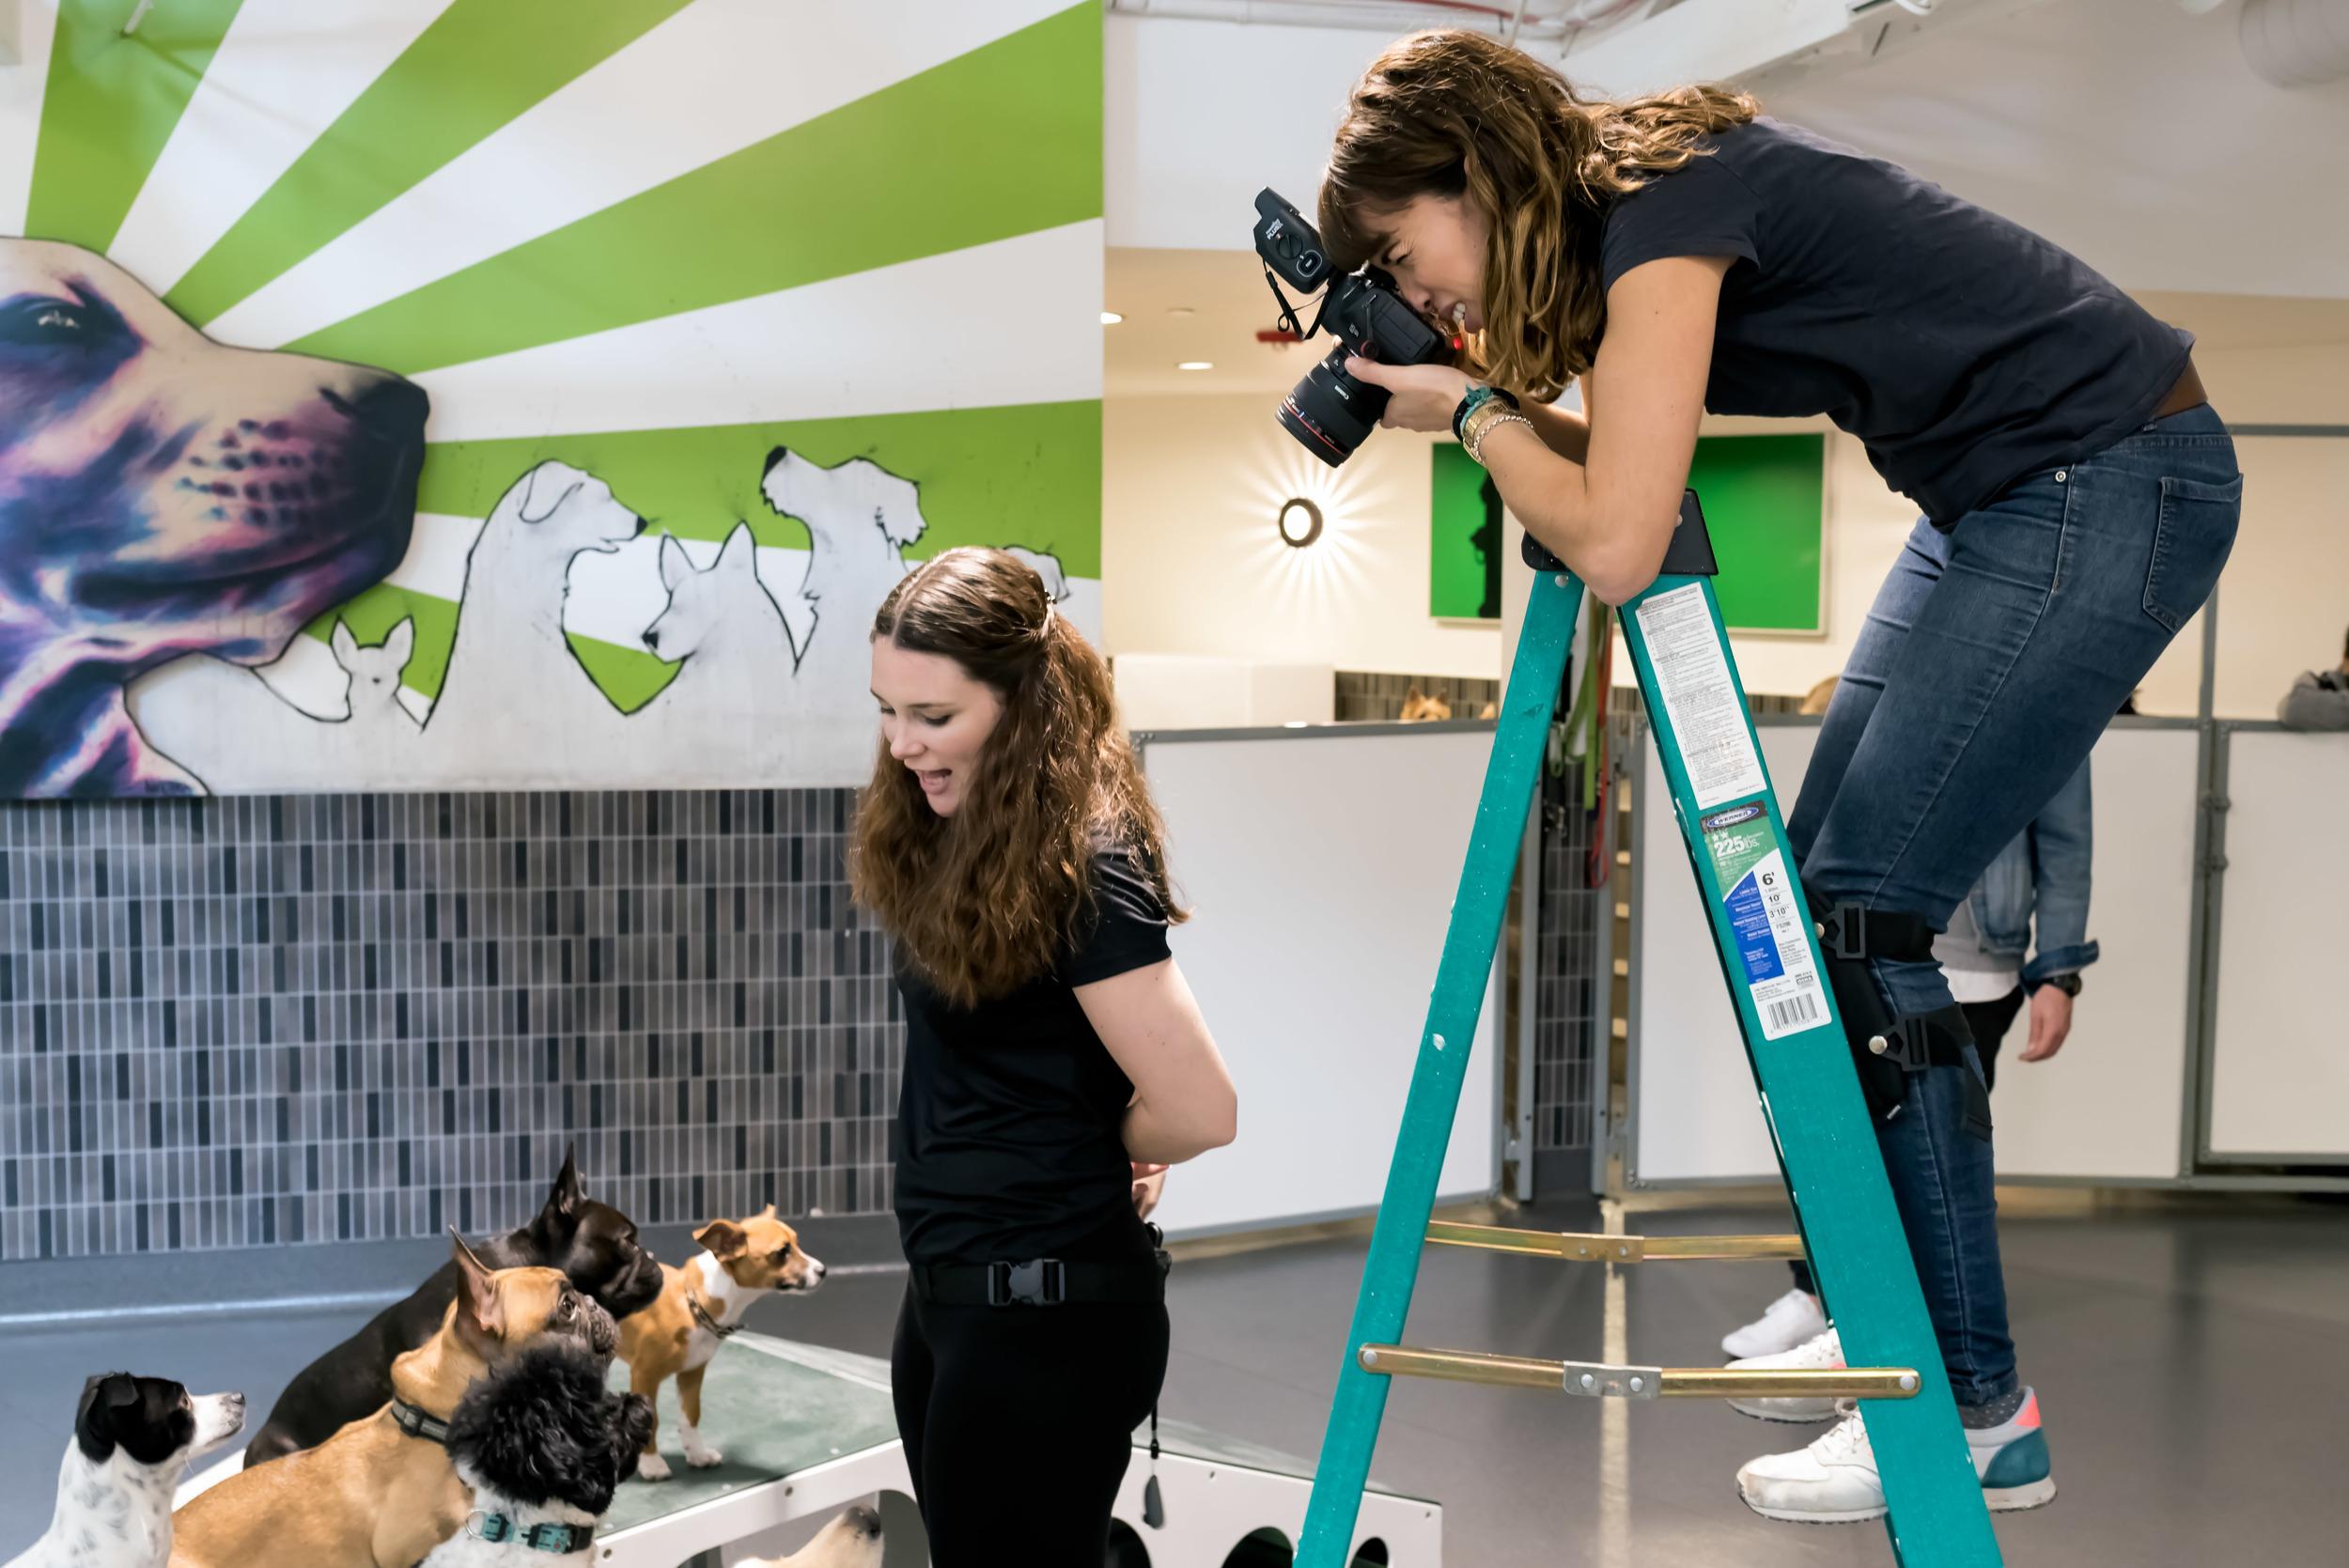 behind-the-scenes-dog-photographer-working-on-set-5.jpg